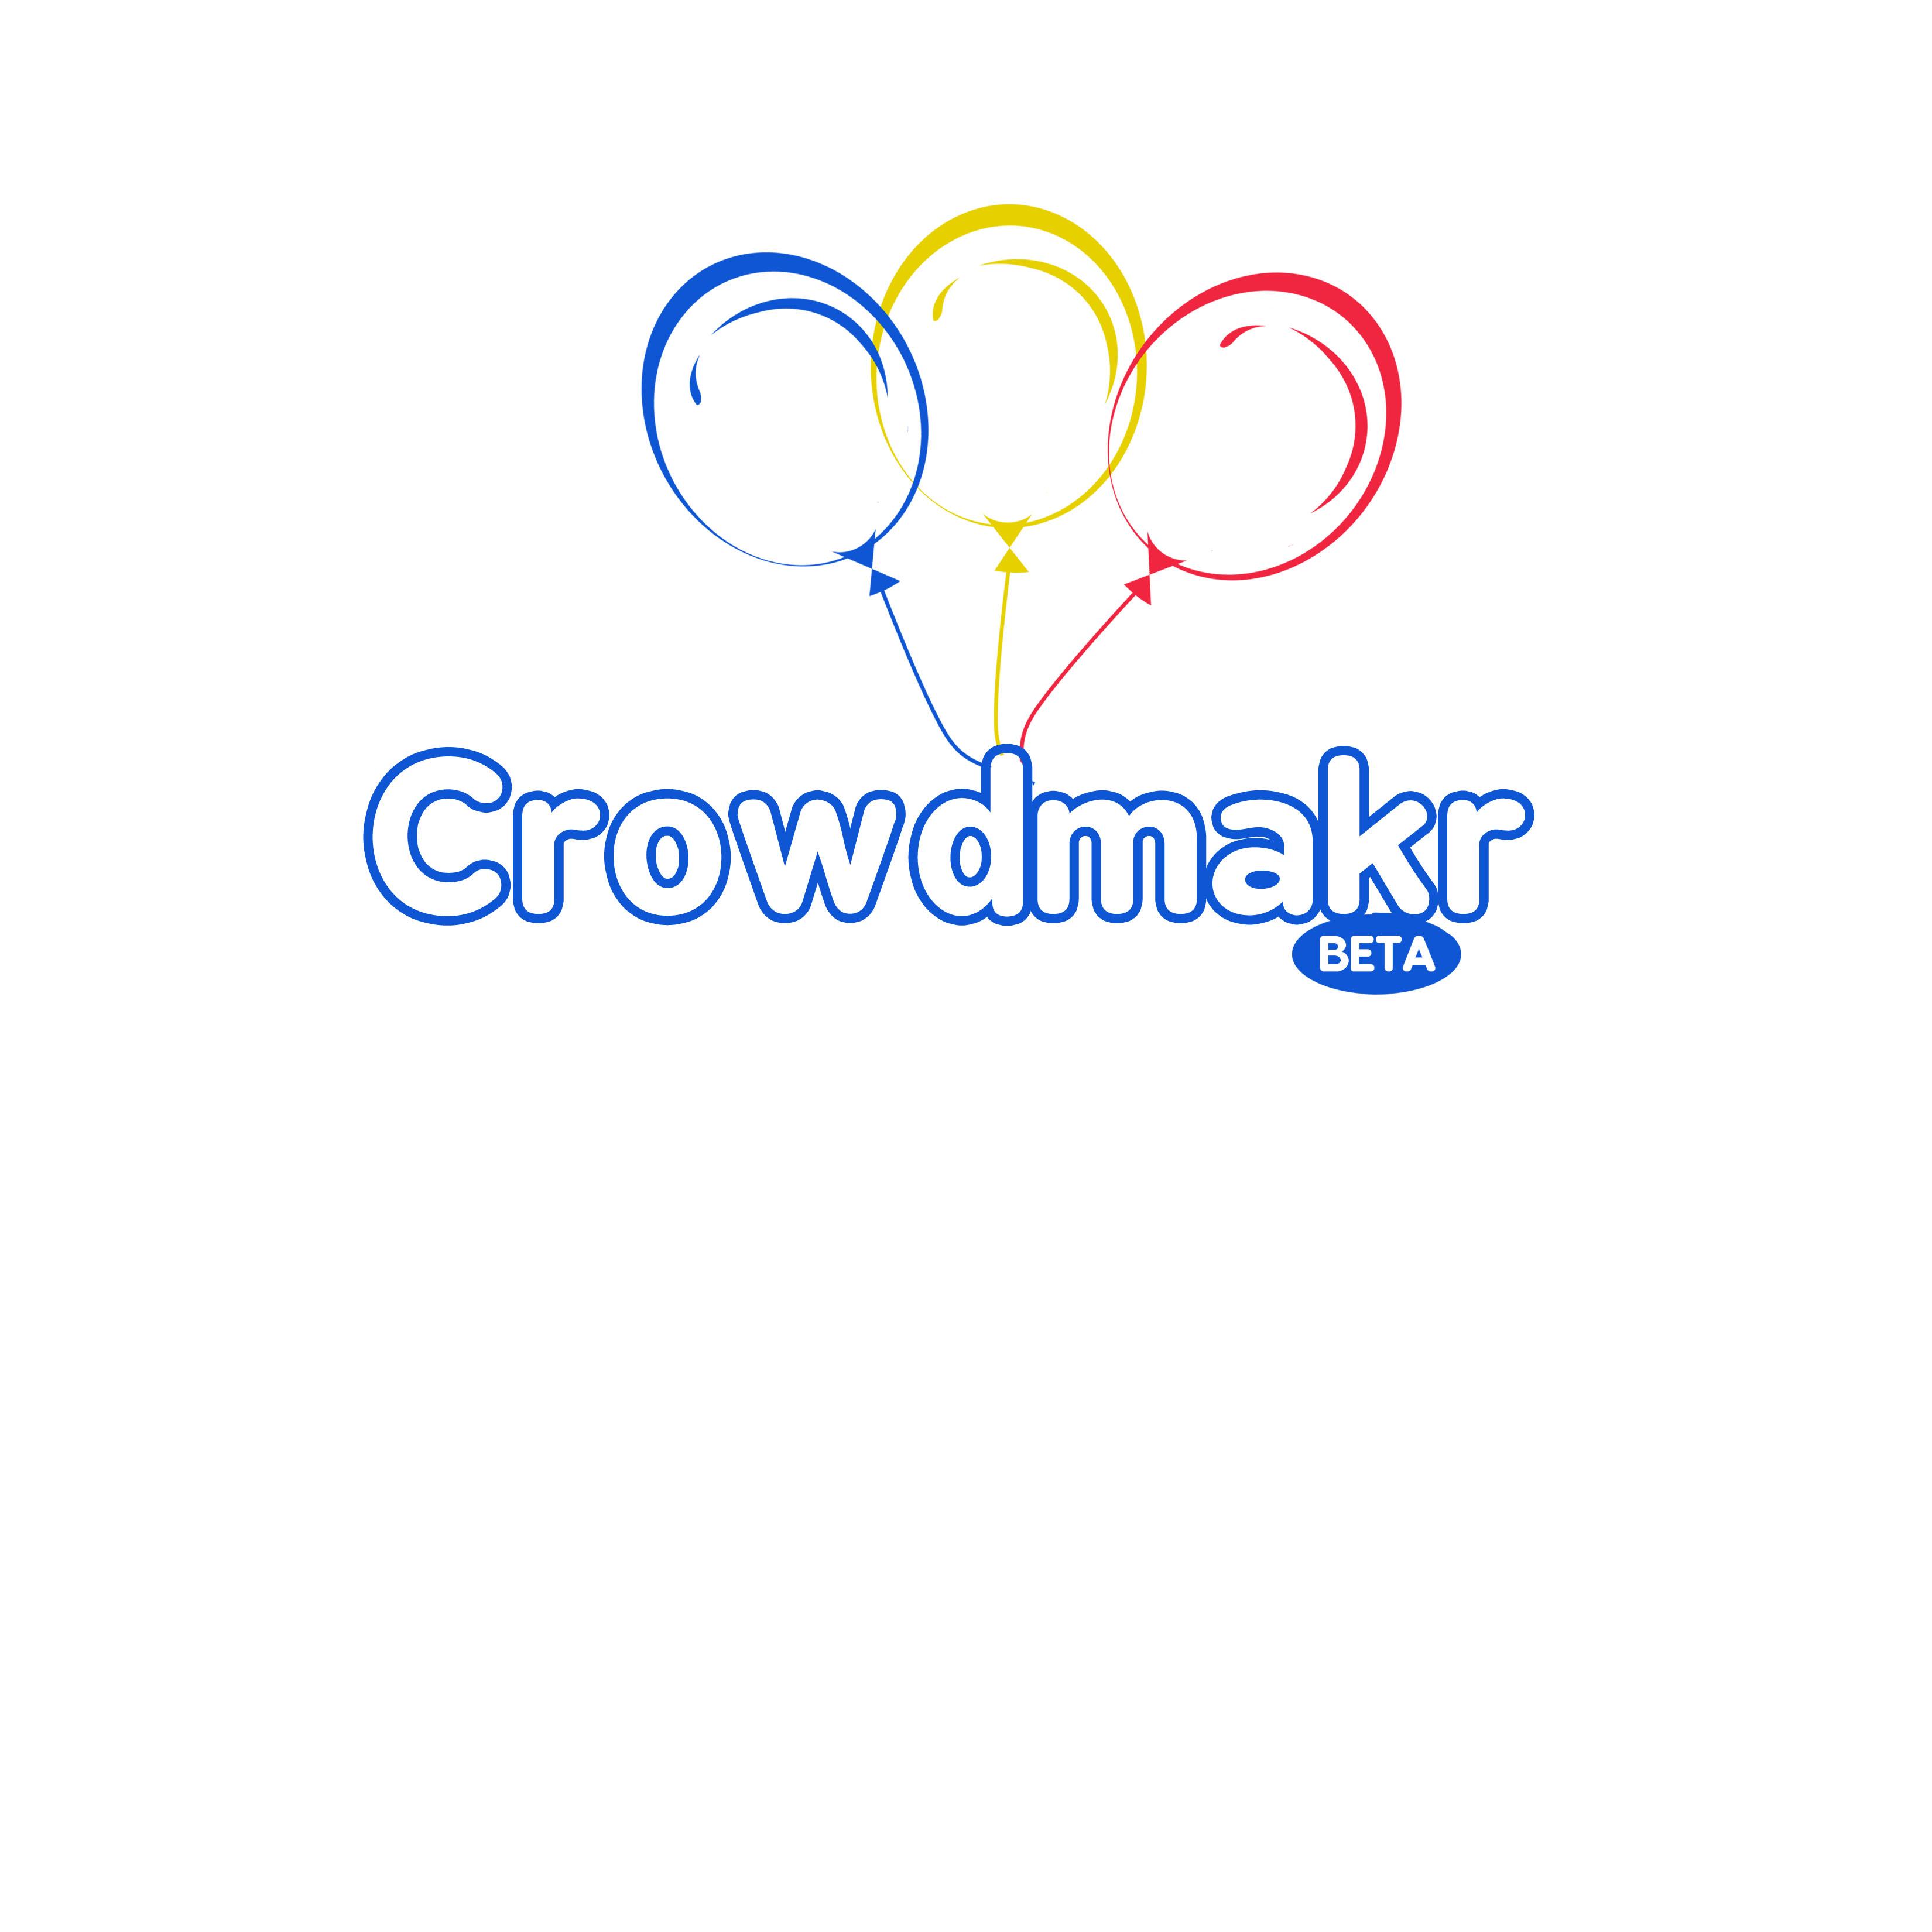 Logo Design by Allan Esclamado - Entry No. 52 in the Logo Design Contest Unique Logo Design Wanted for crowdmakr.